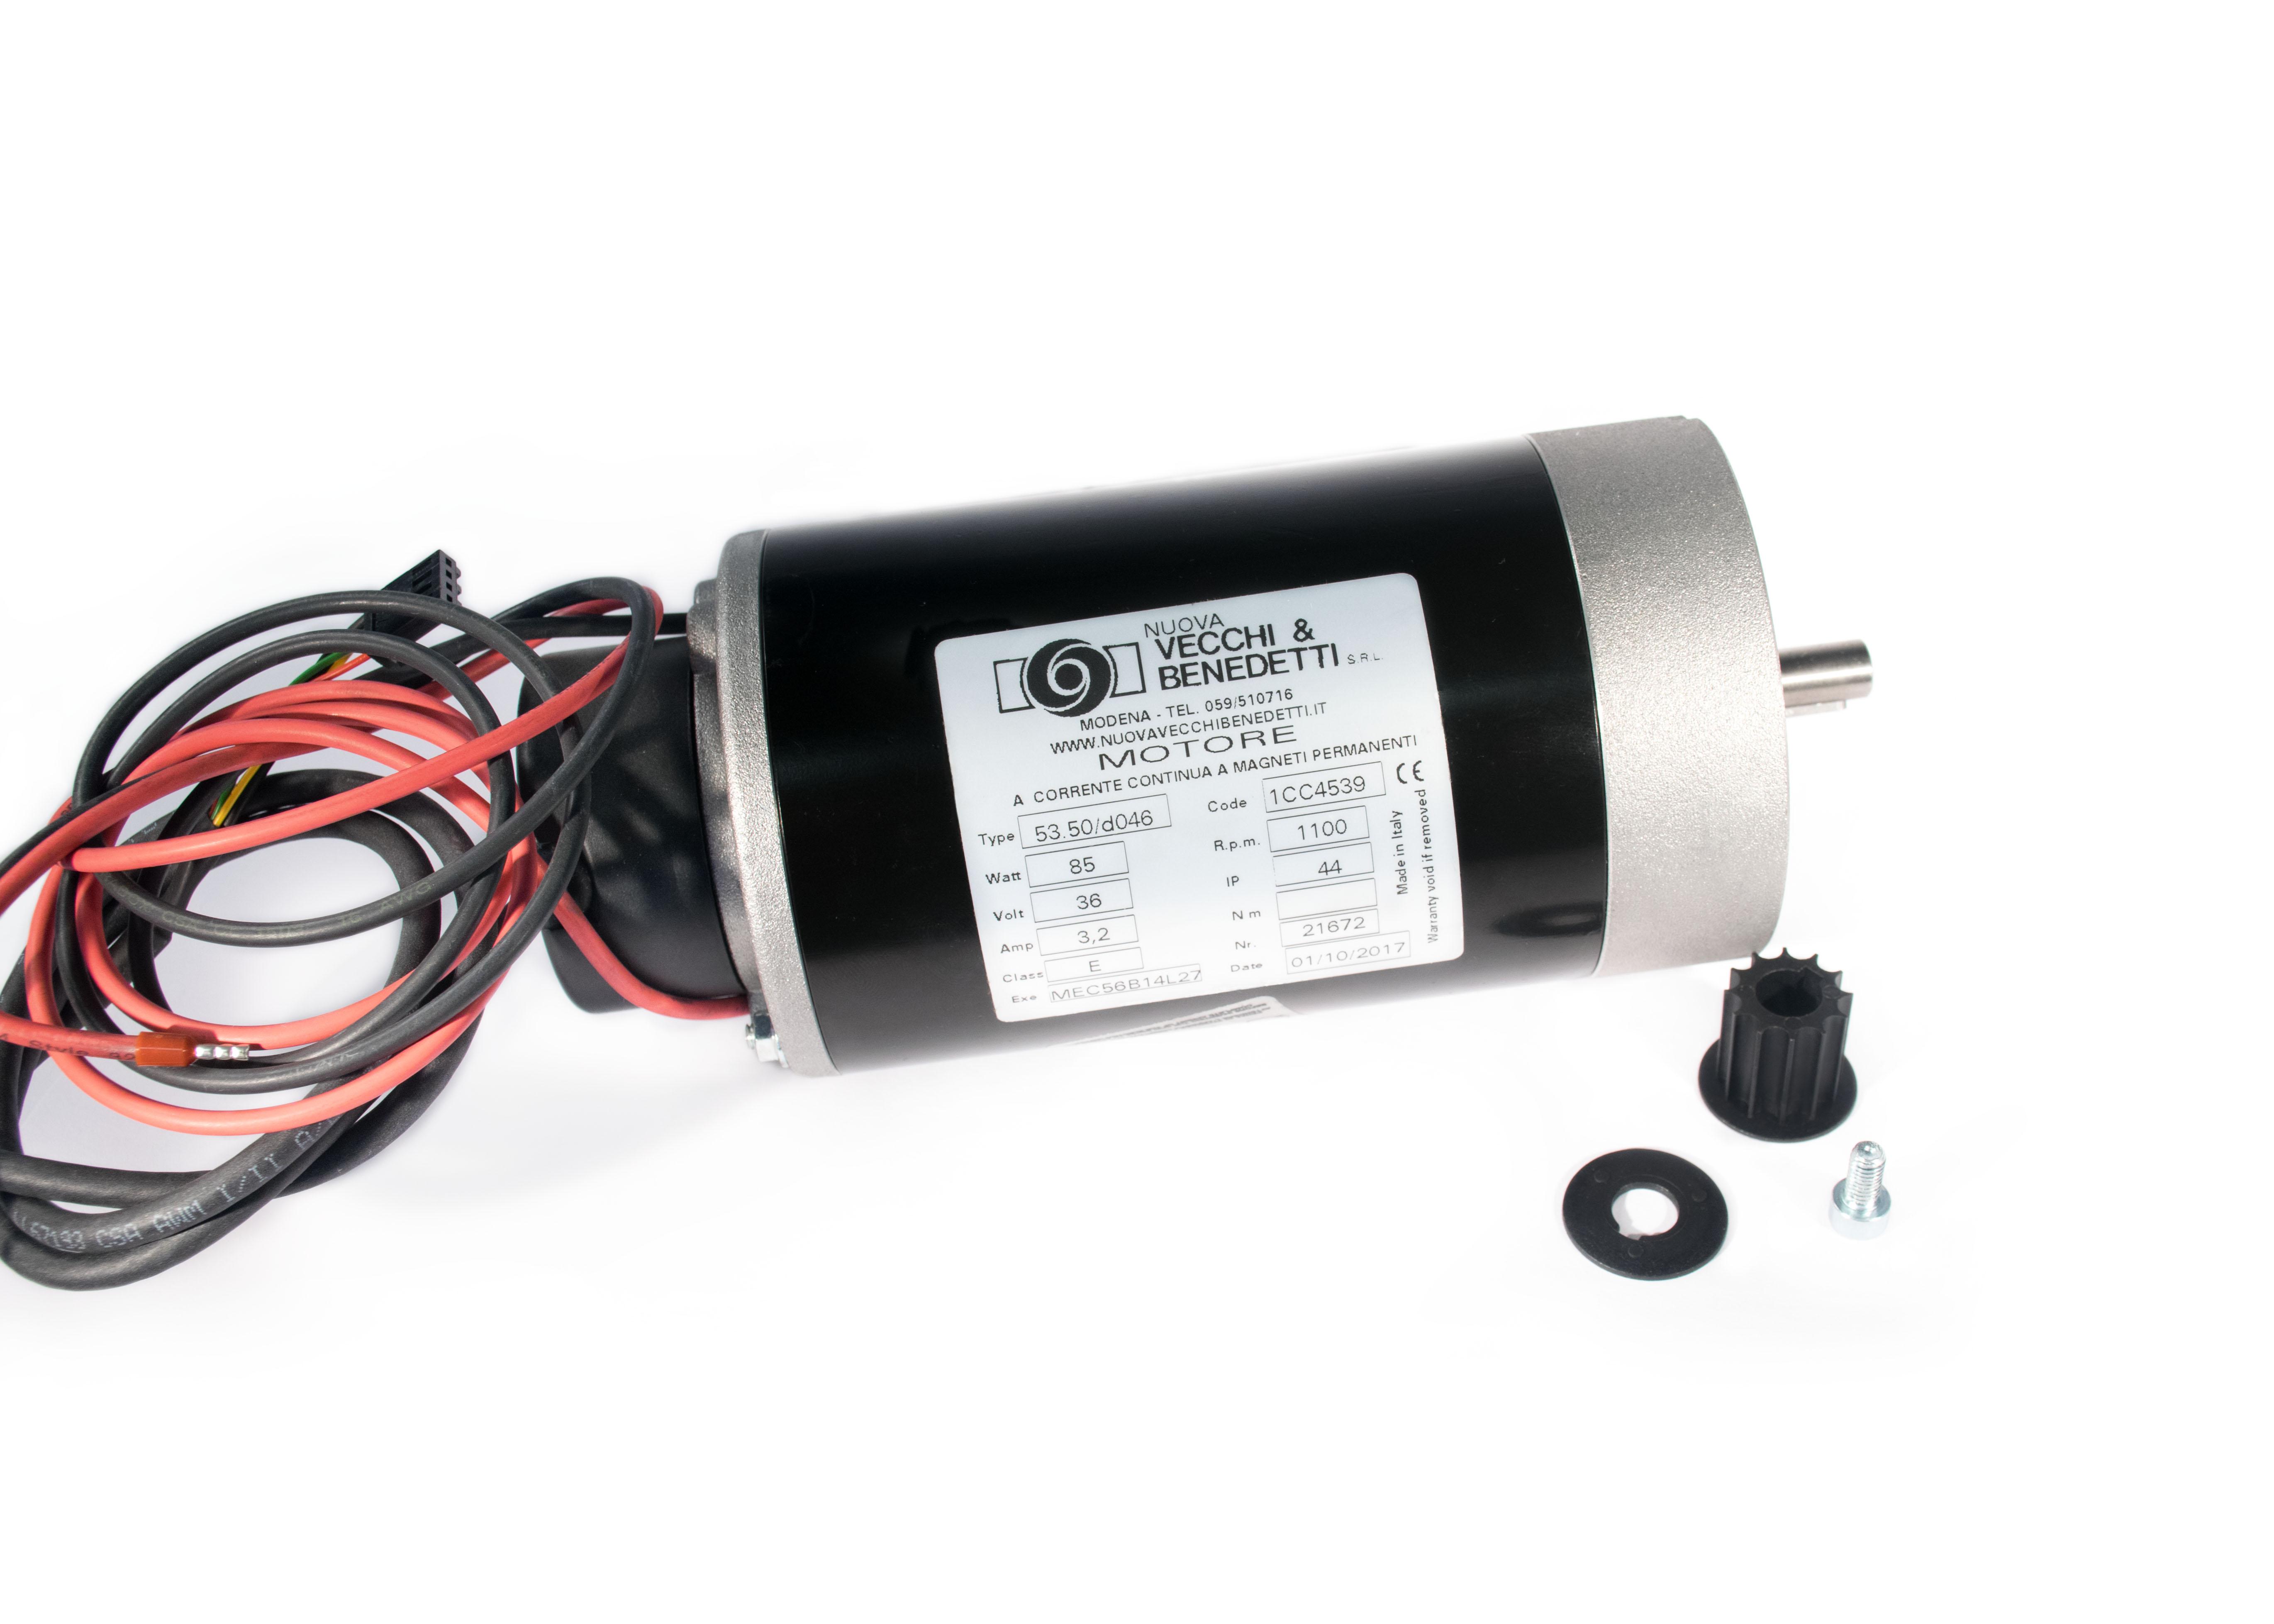 Motor OLS# 146476 Image